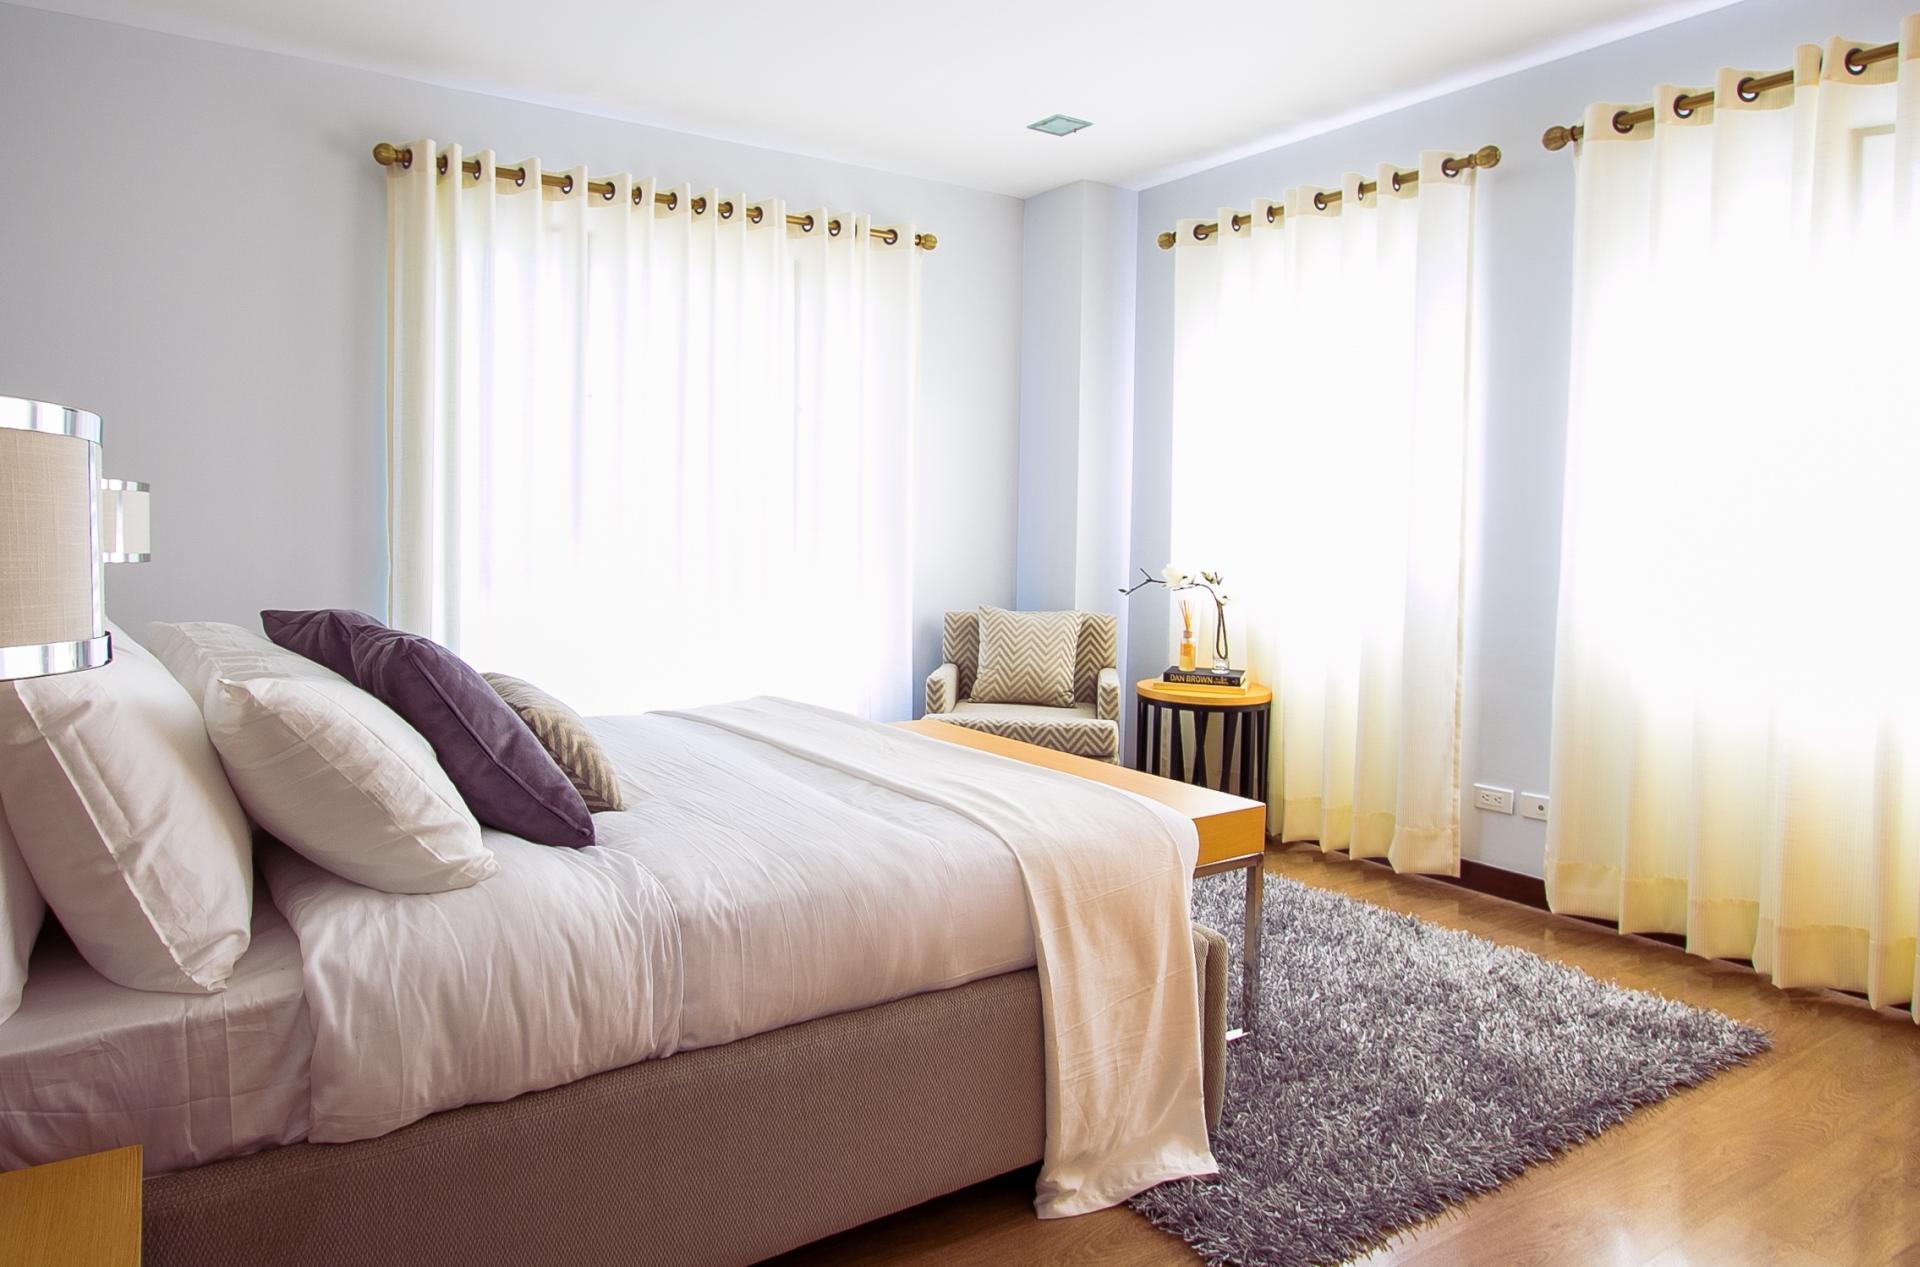 airbnb-short-term-rentals-in-singapore